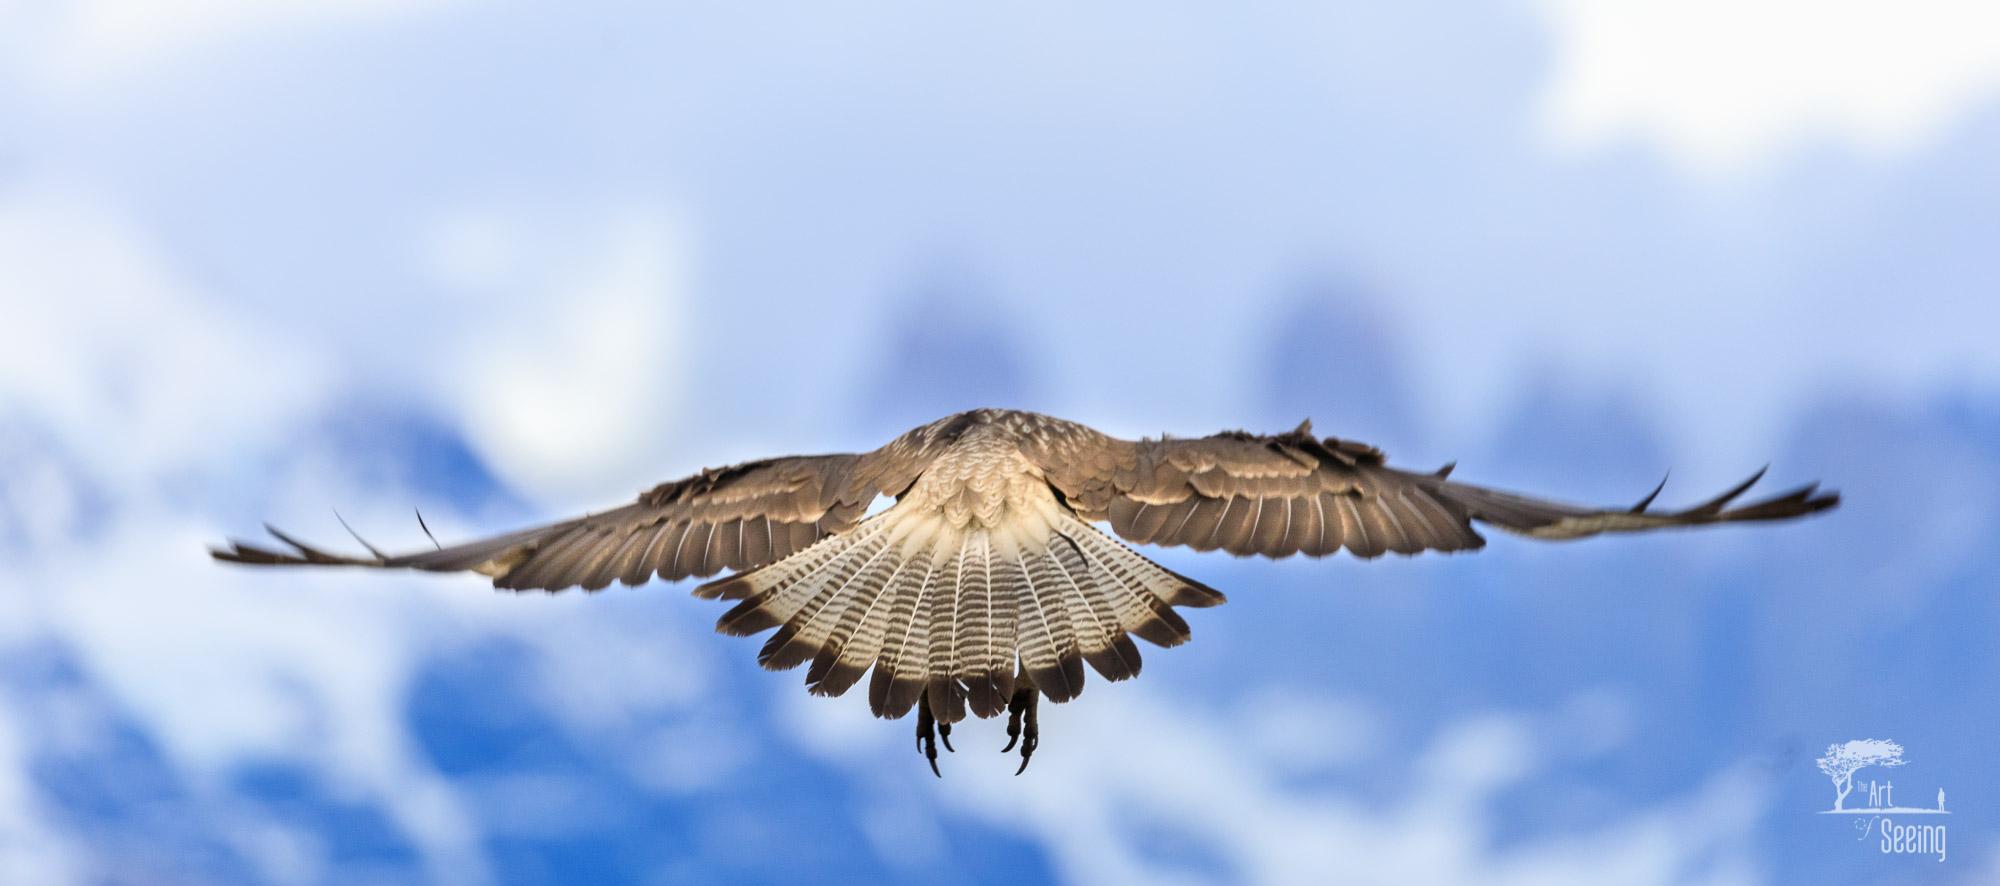 patagonia photography 2 image